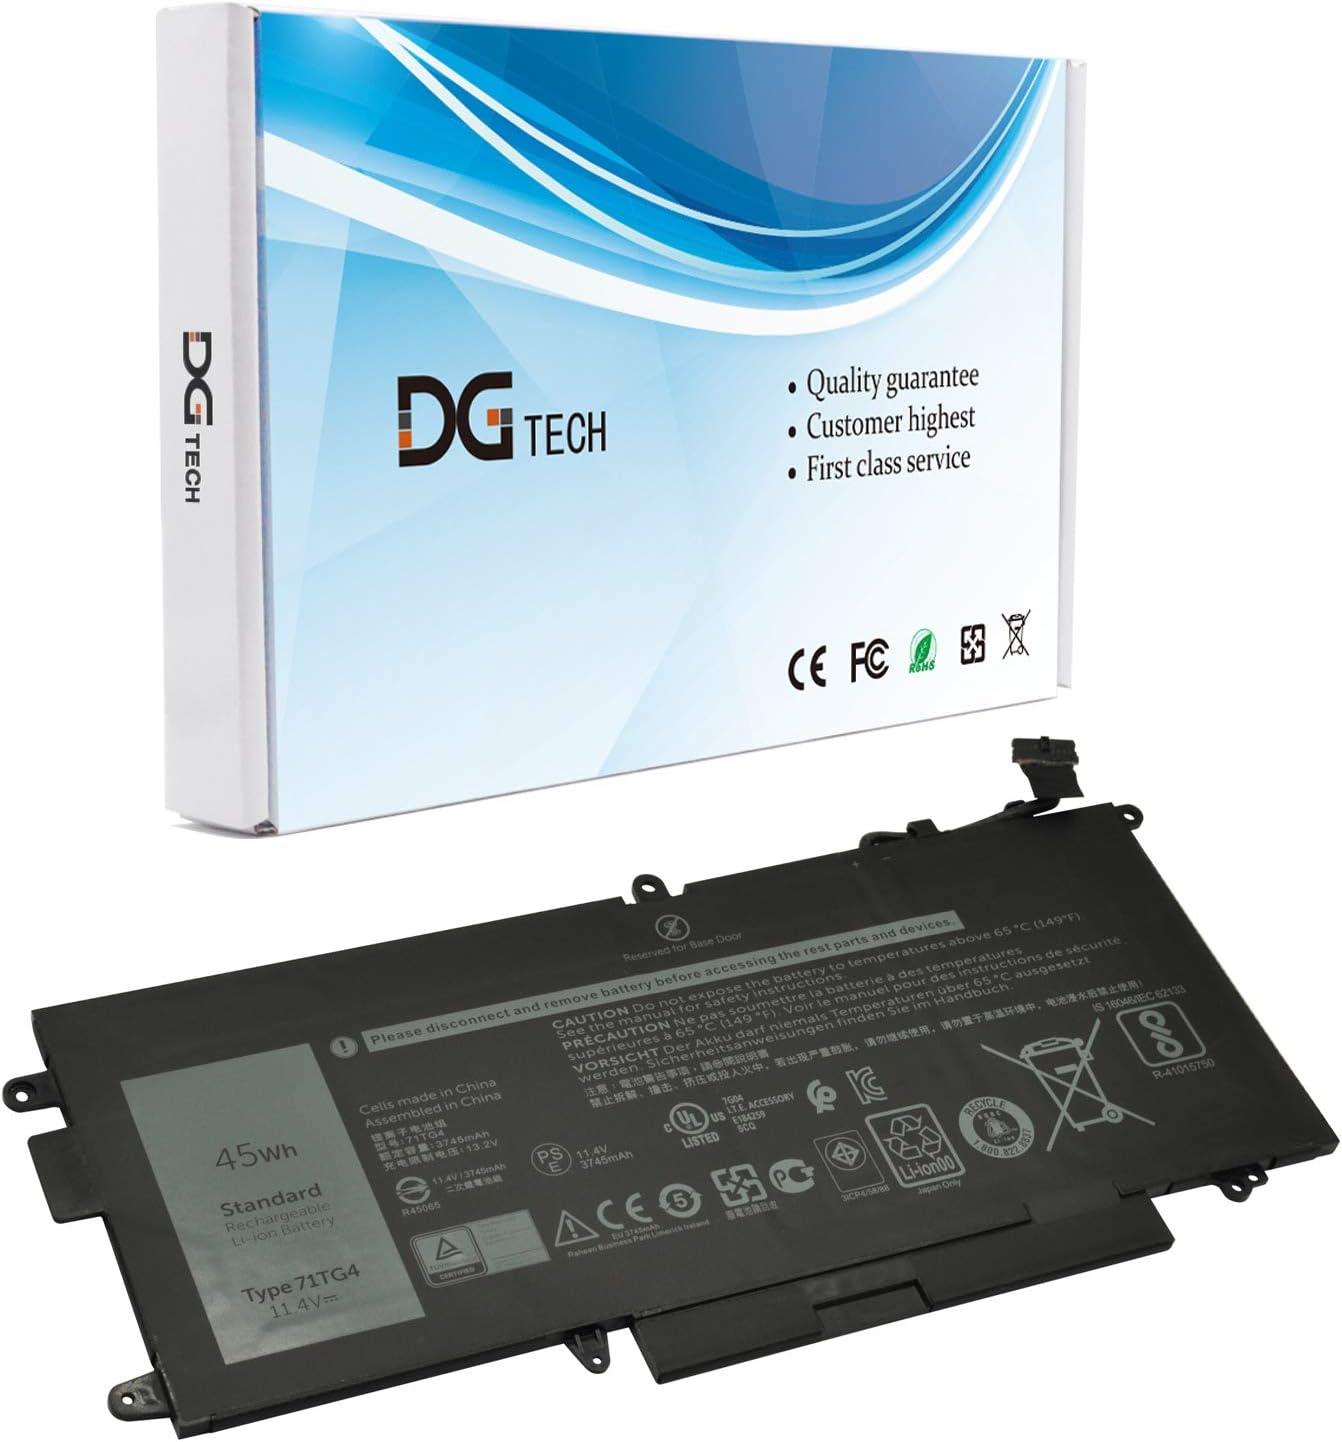 Bateria para Dell Latitude 7280 5289 5389 71TG4 11.4V 45Wh